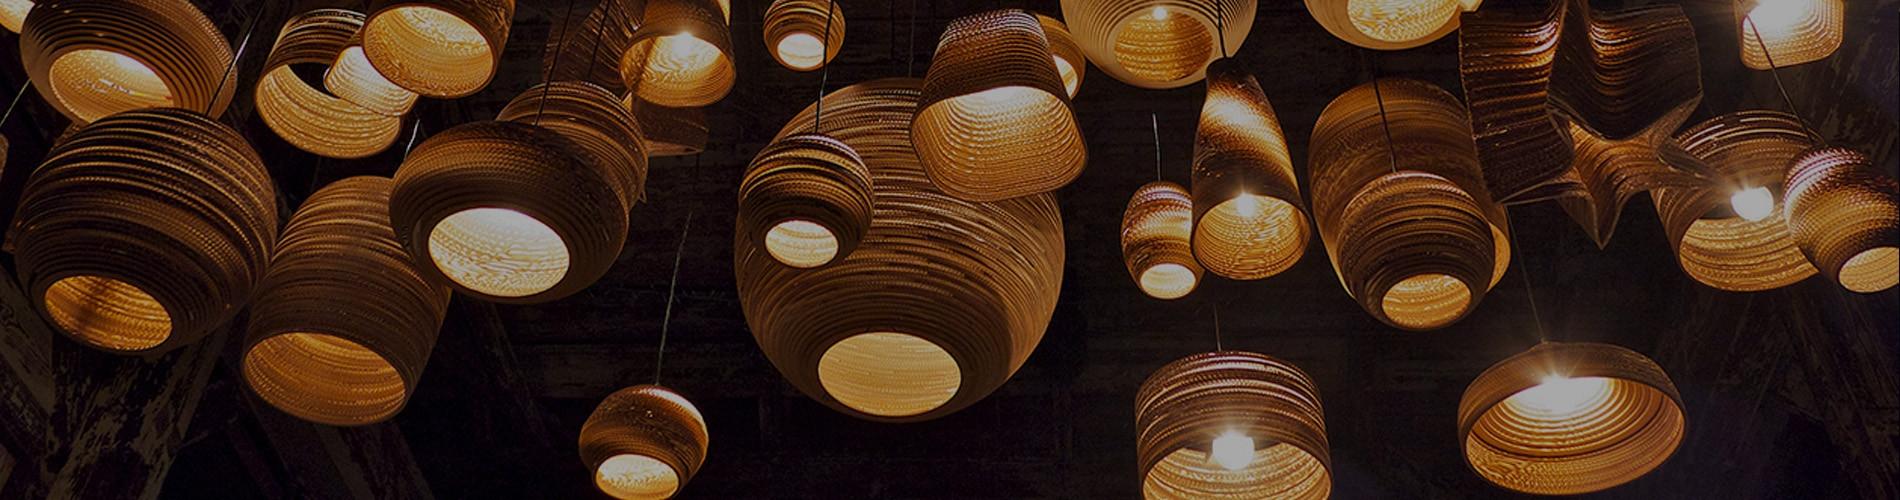 Designers Pendant Lights | Metal | Glass | Cardboard | Wood